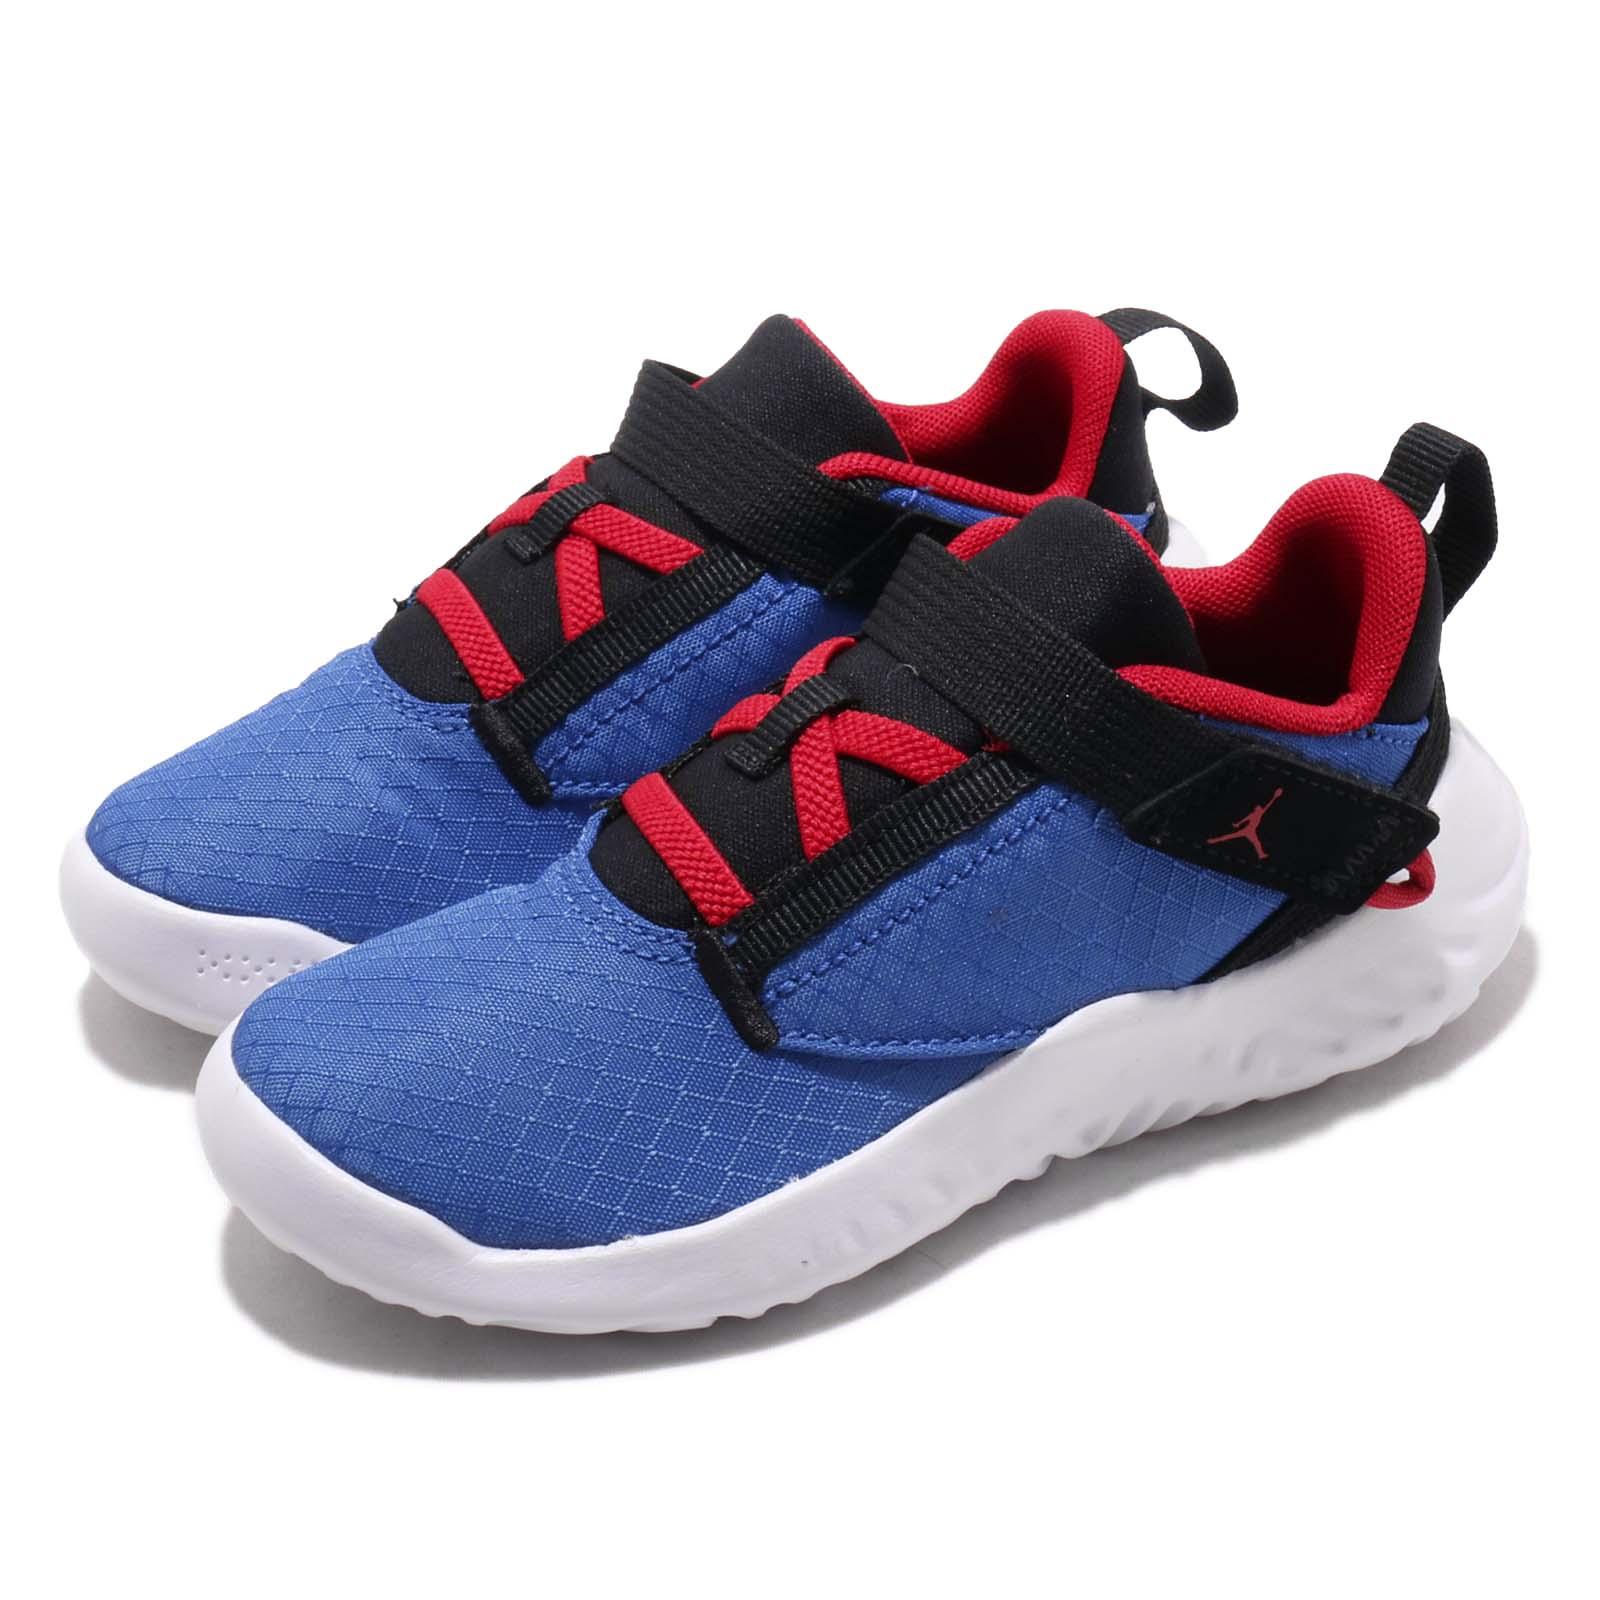 Nike 休閒鞋 Jordan Proto 23 童鞋 AT5713-401